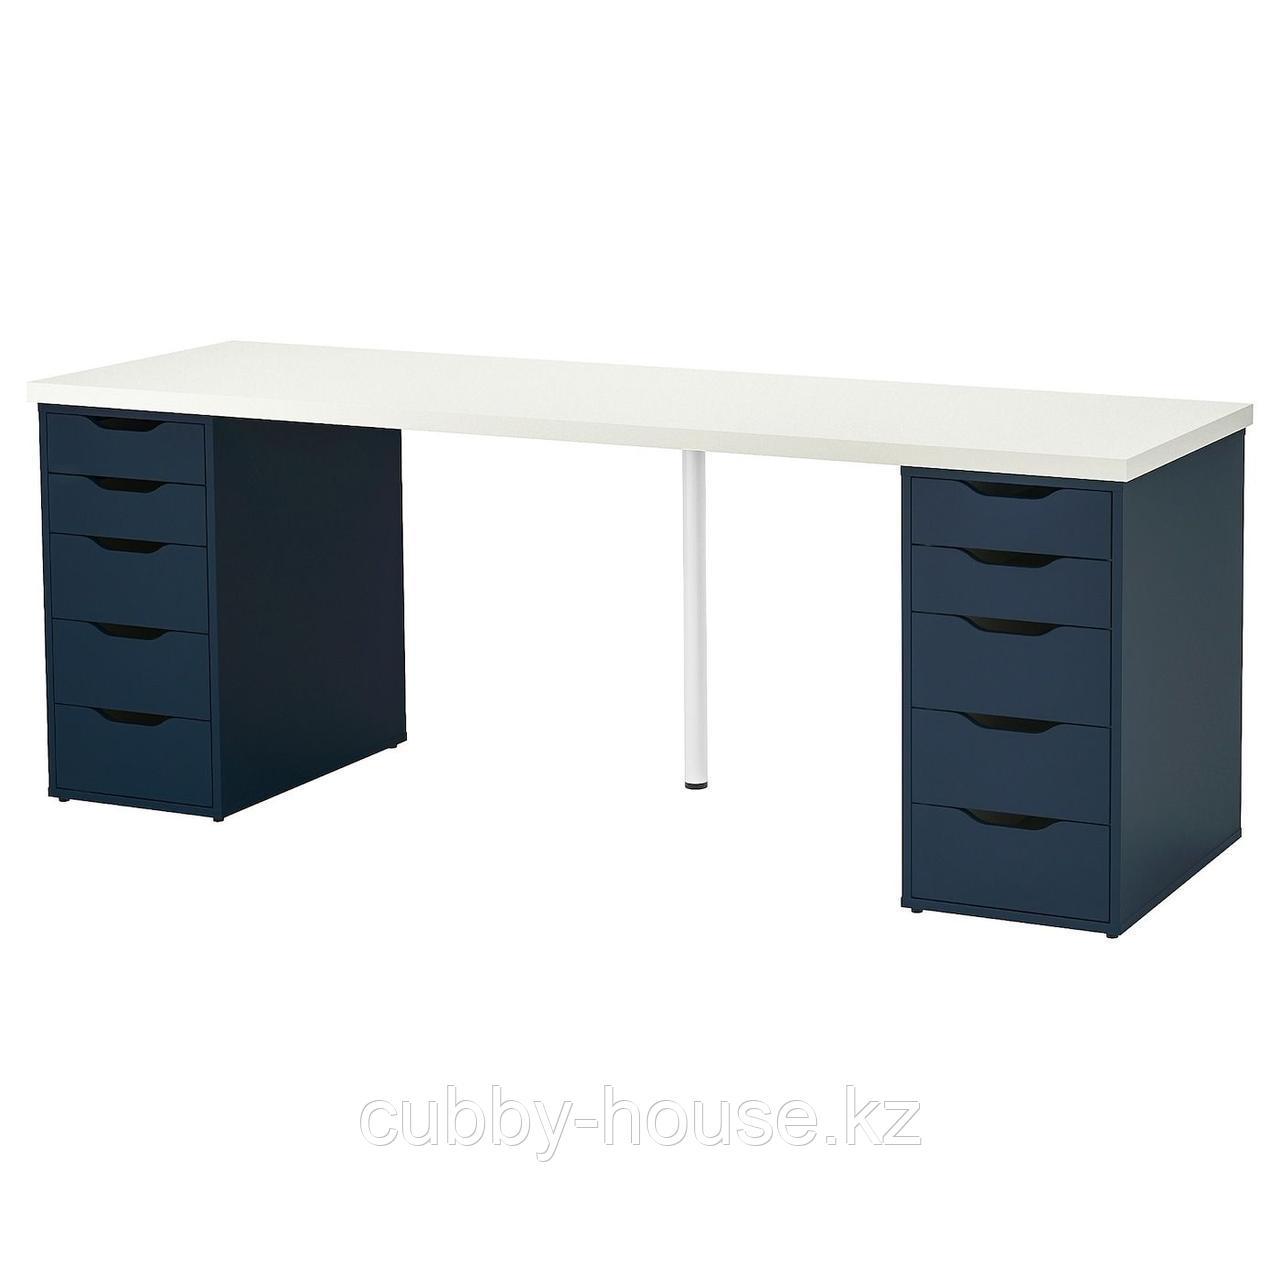 ЛИННМОН / АЛЕКС Стол, черно-коричневый, синий, 200x60 см